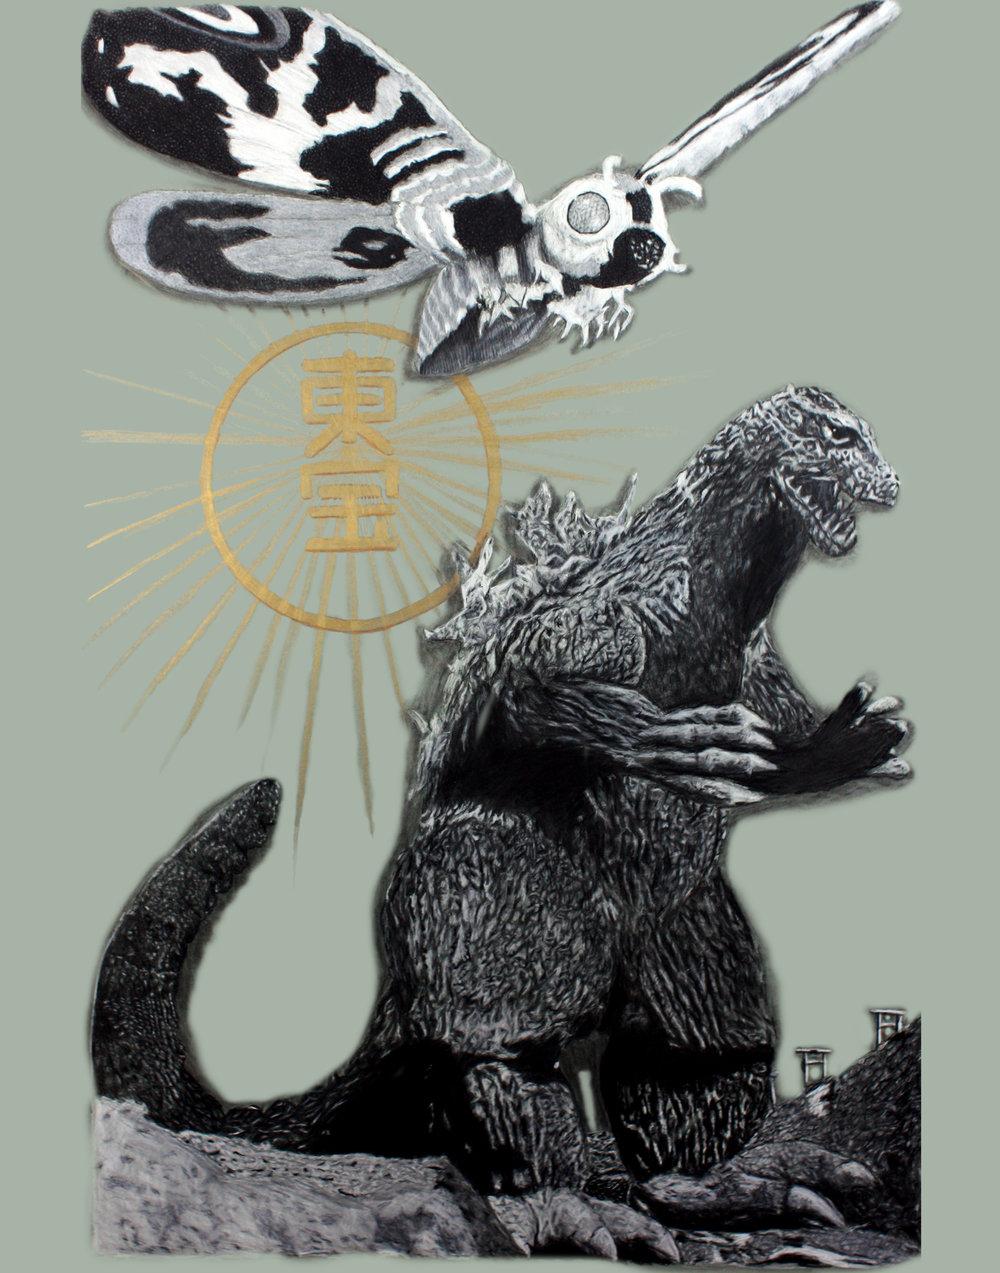 Godzilla and Mothra wide copy.jpg